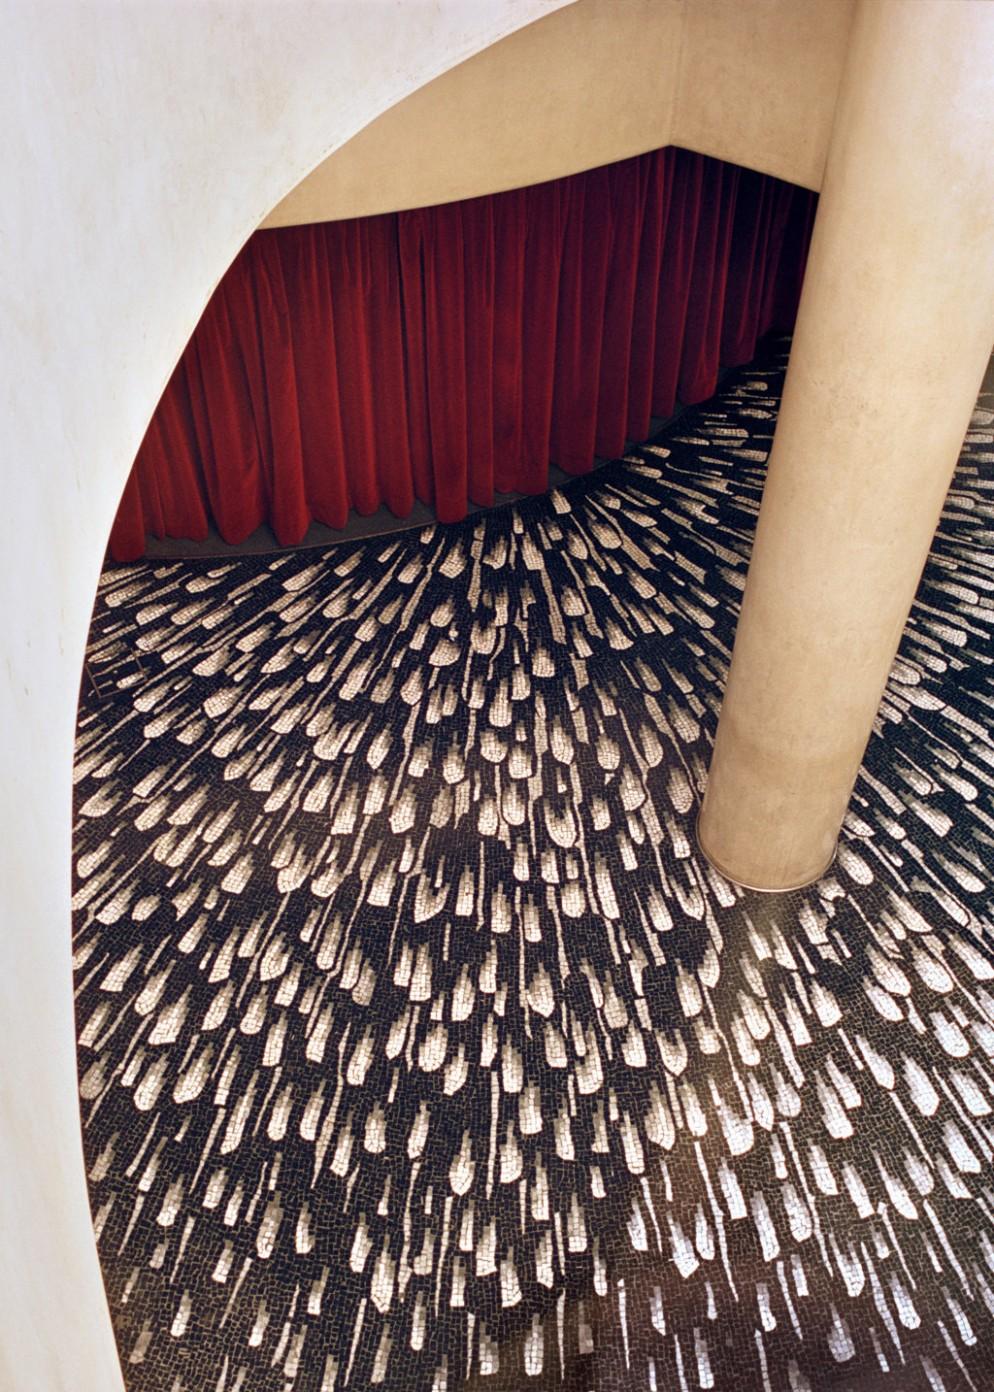 milano-architettura-042 1 -ph_stefan-giftthaler-livingcorriere